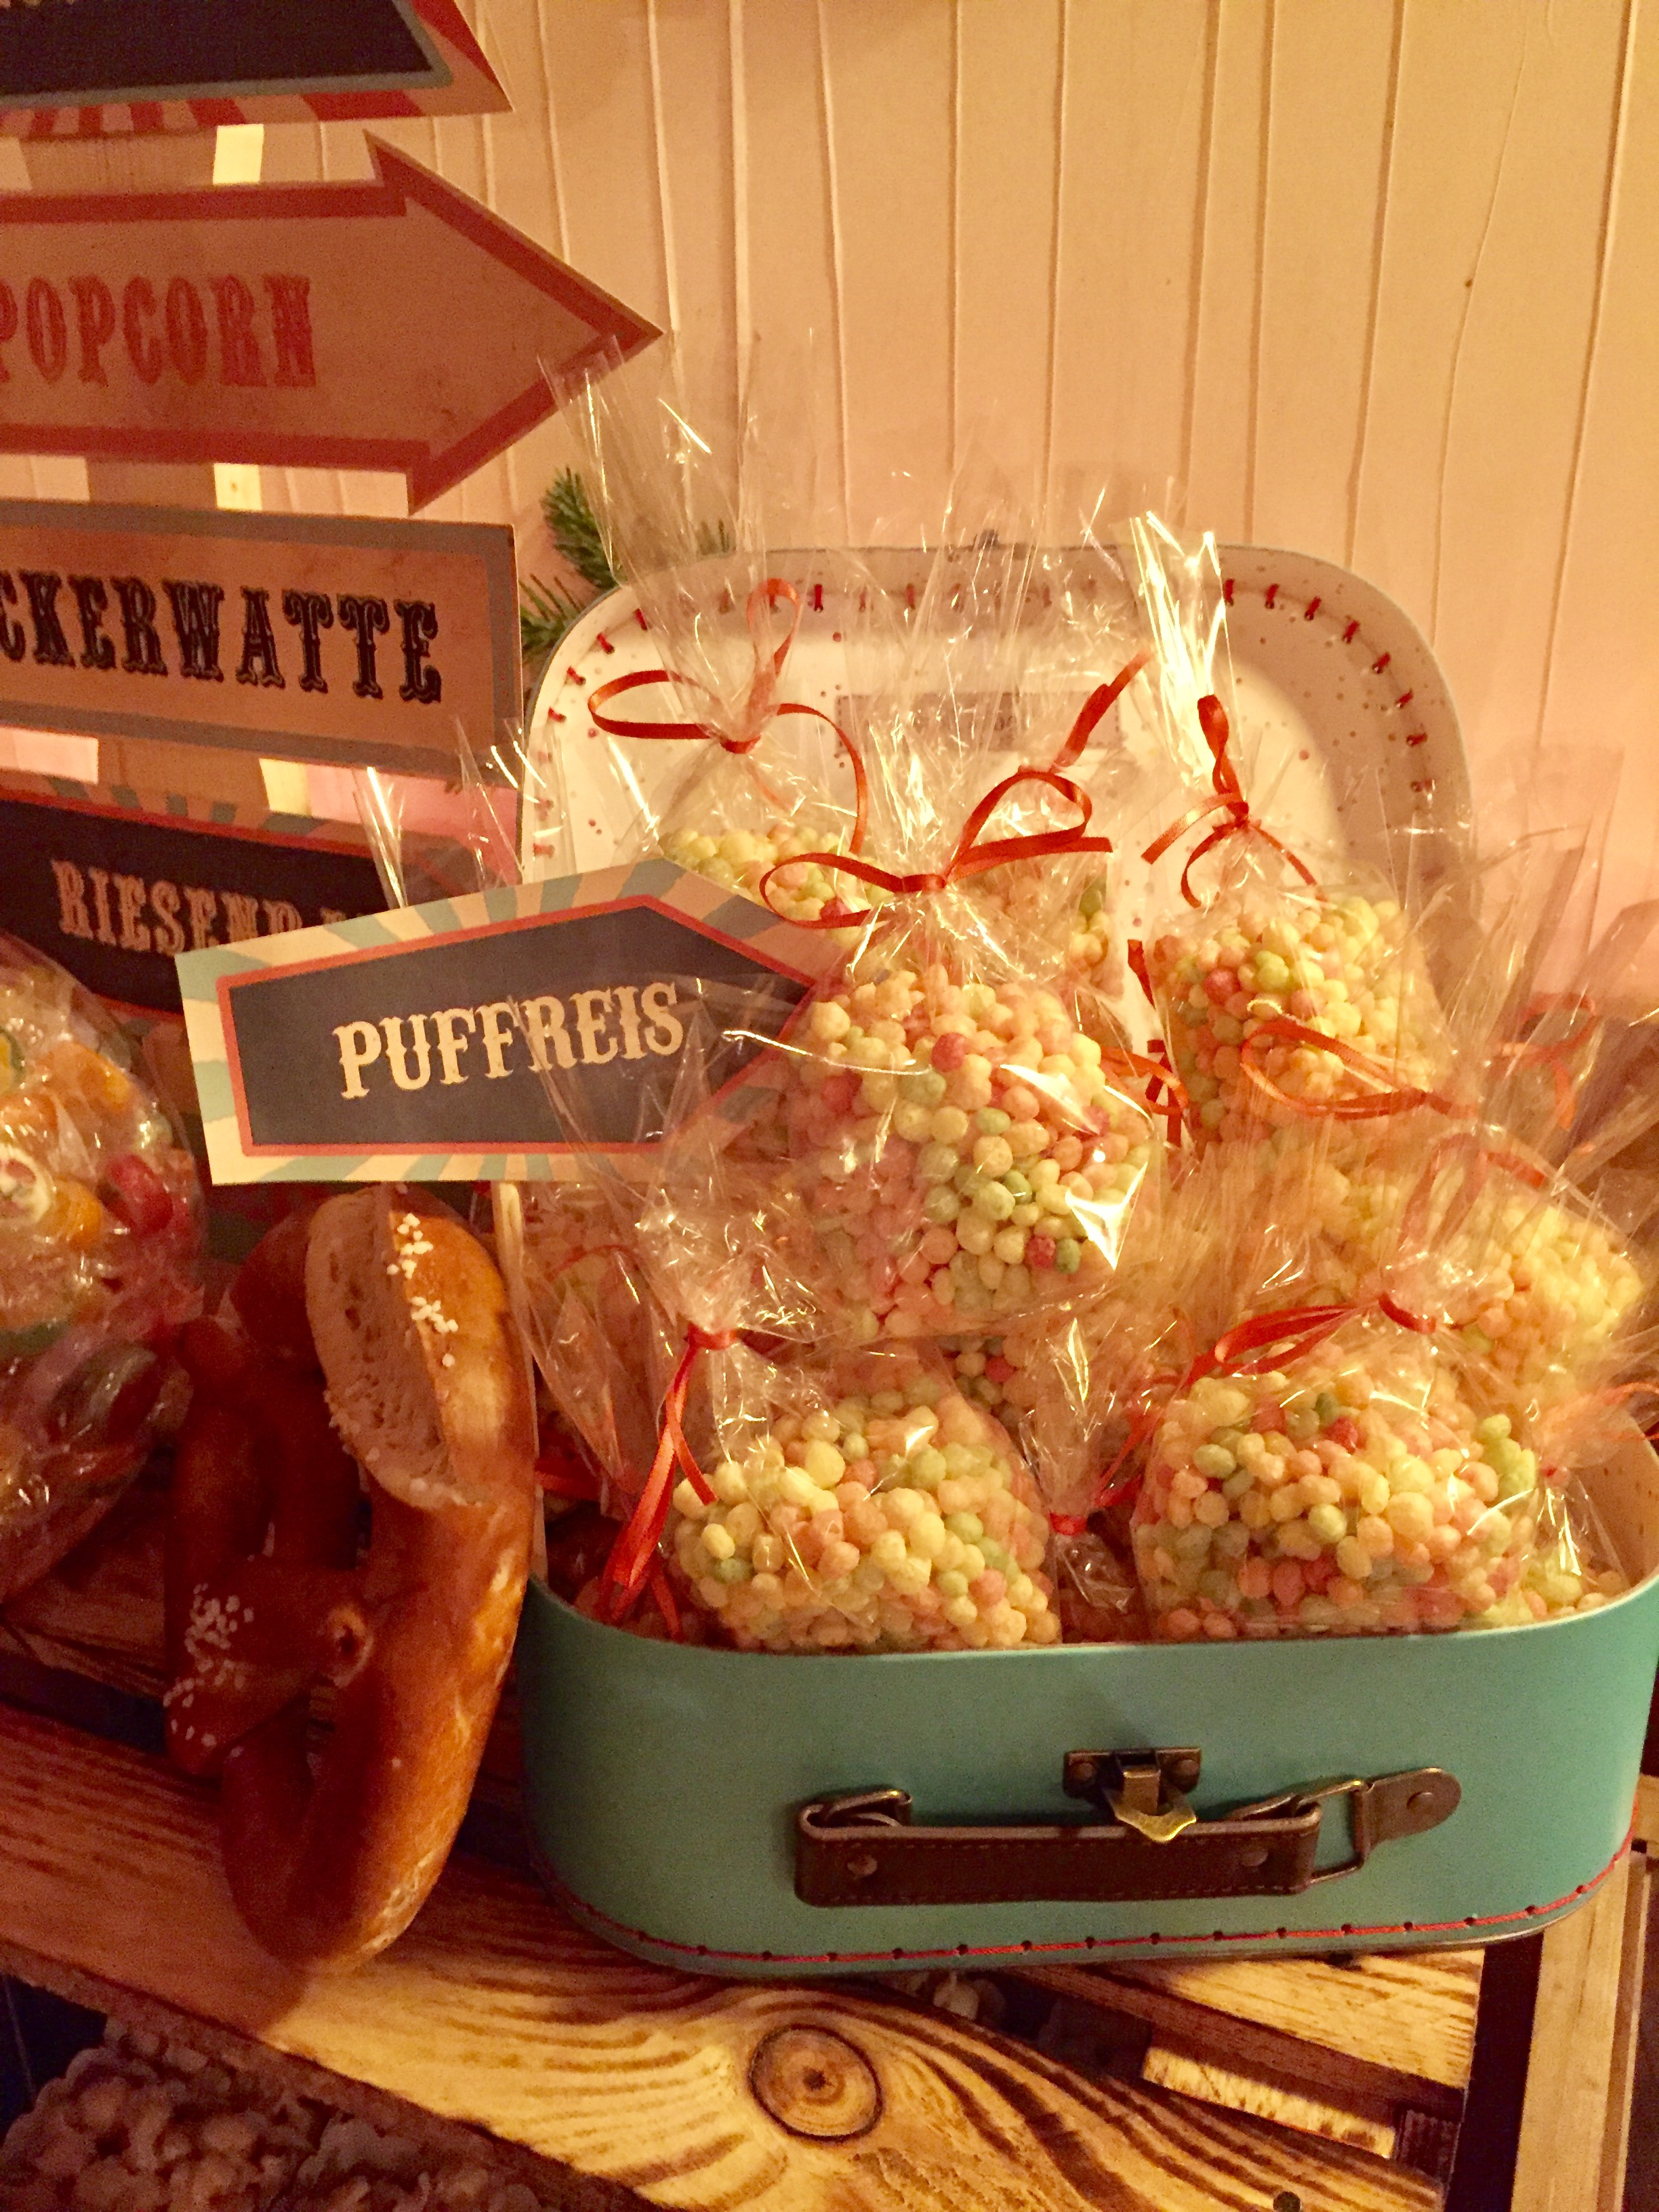 candy-bar-stuttgart-mieten-motto-theme-jahrmarkt-vintage-fun-fair-puffreis